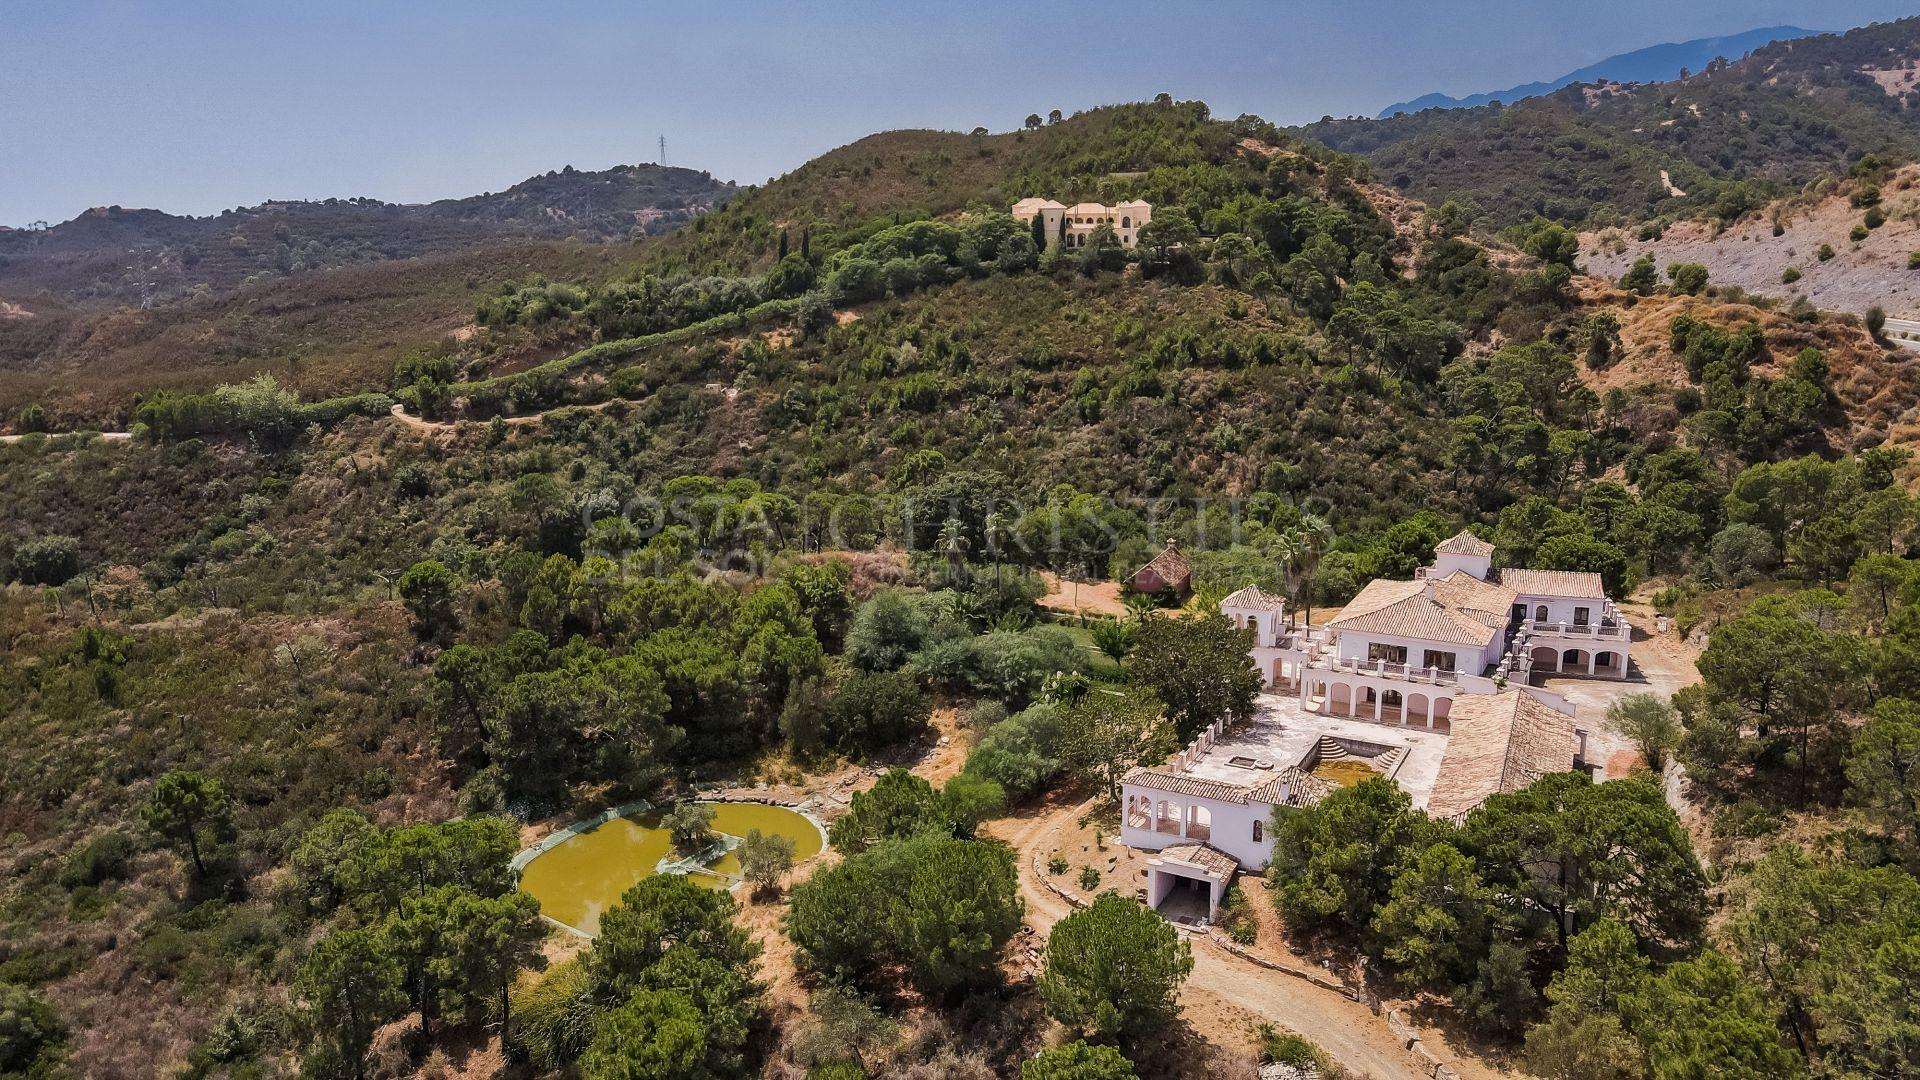 2 Majestic Villas for sale together in Arroyo de las Cañas, Estepona | Christie's International Real Estate